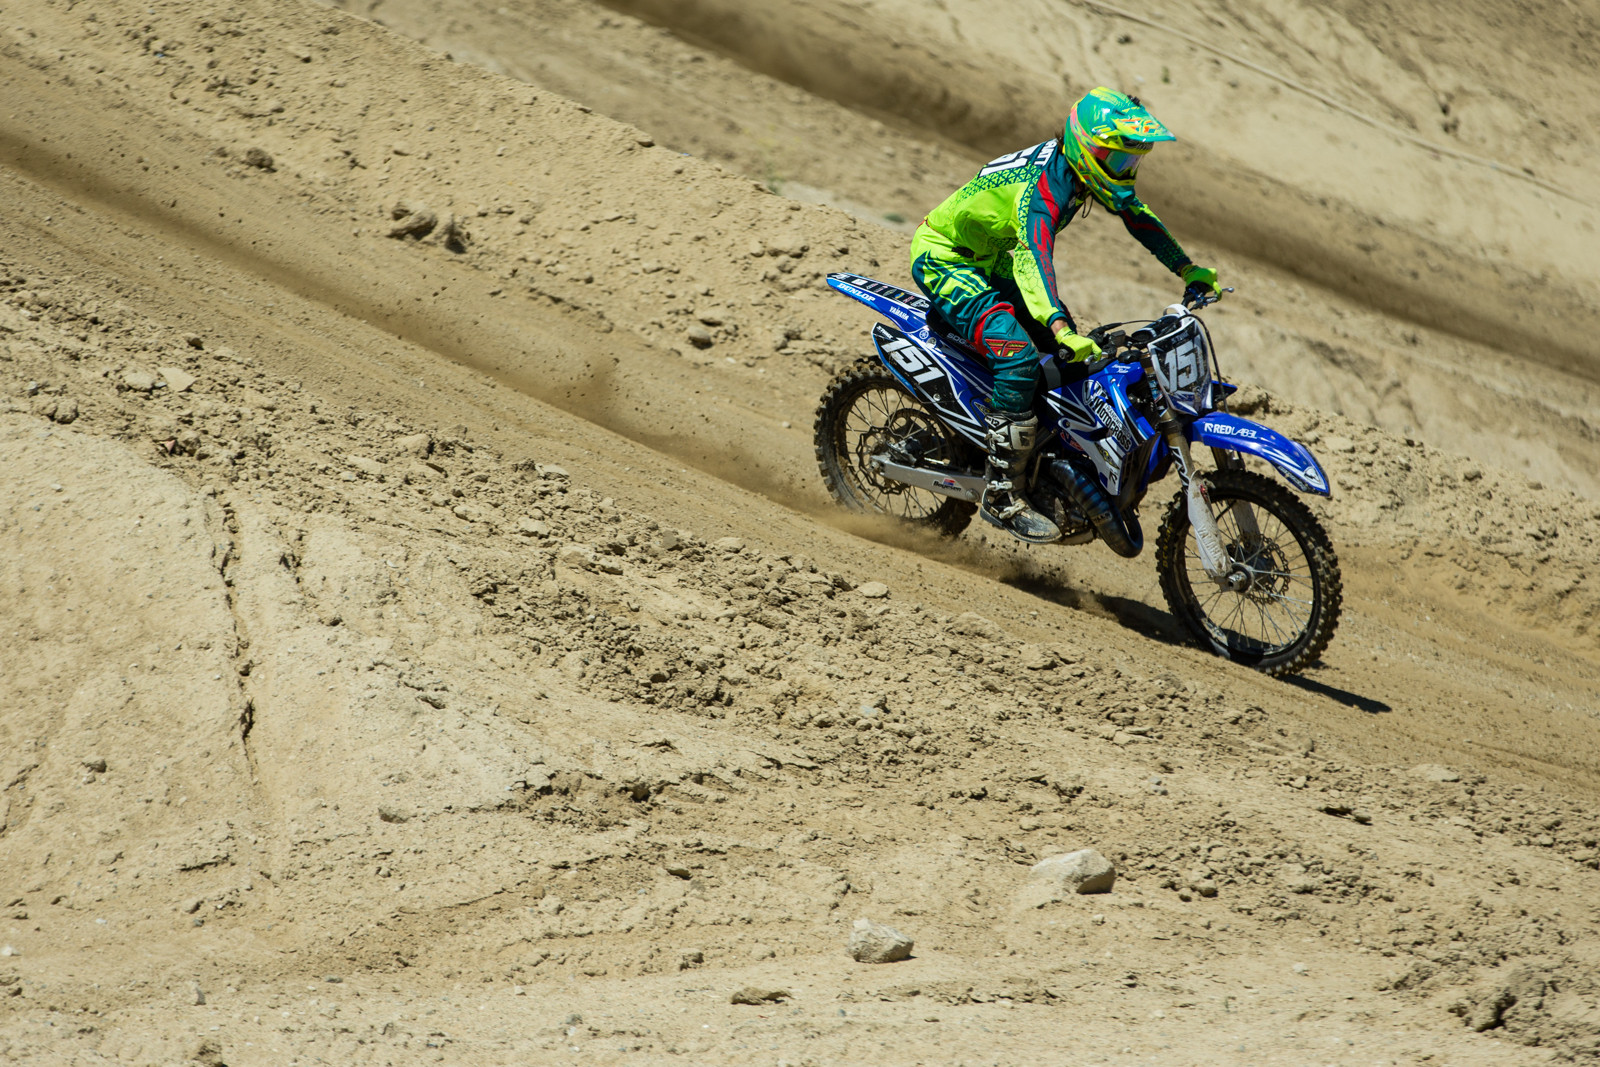 Ryan Surratt - 2016 MTA World Two-Stroke Nationals - Motocross Pictures - Vital MX